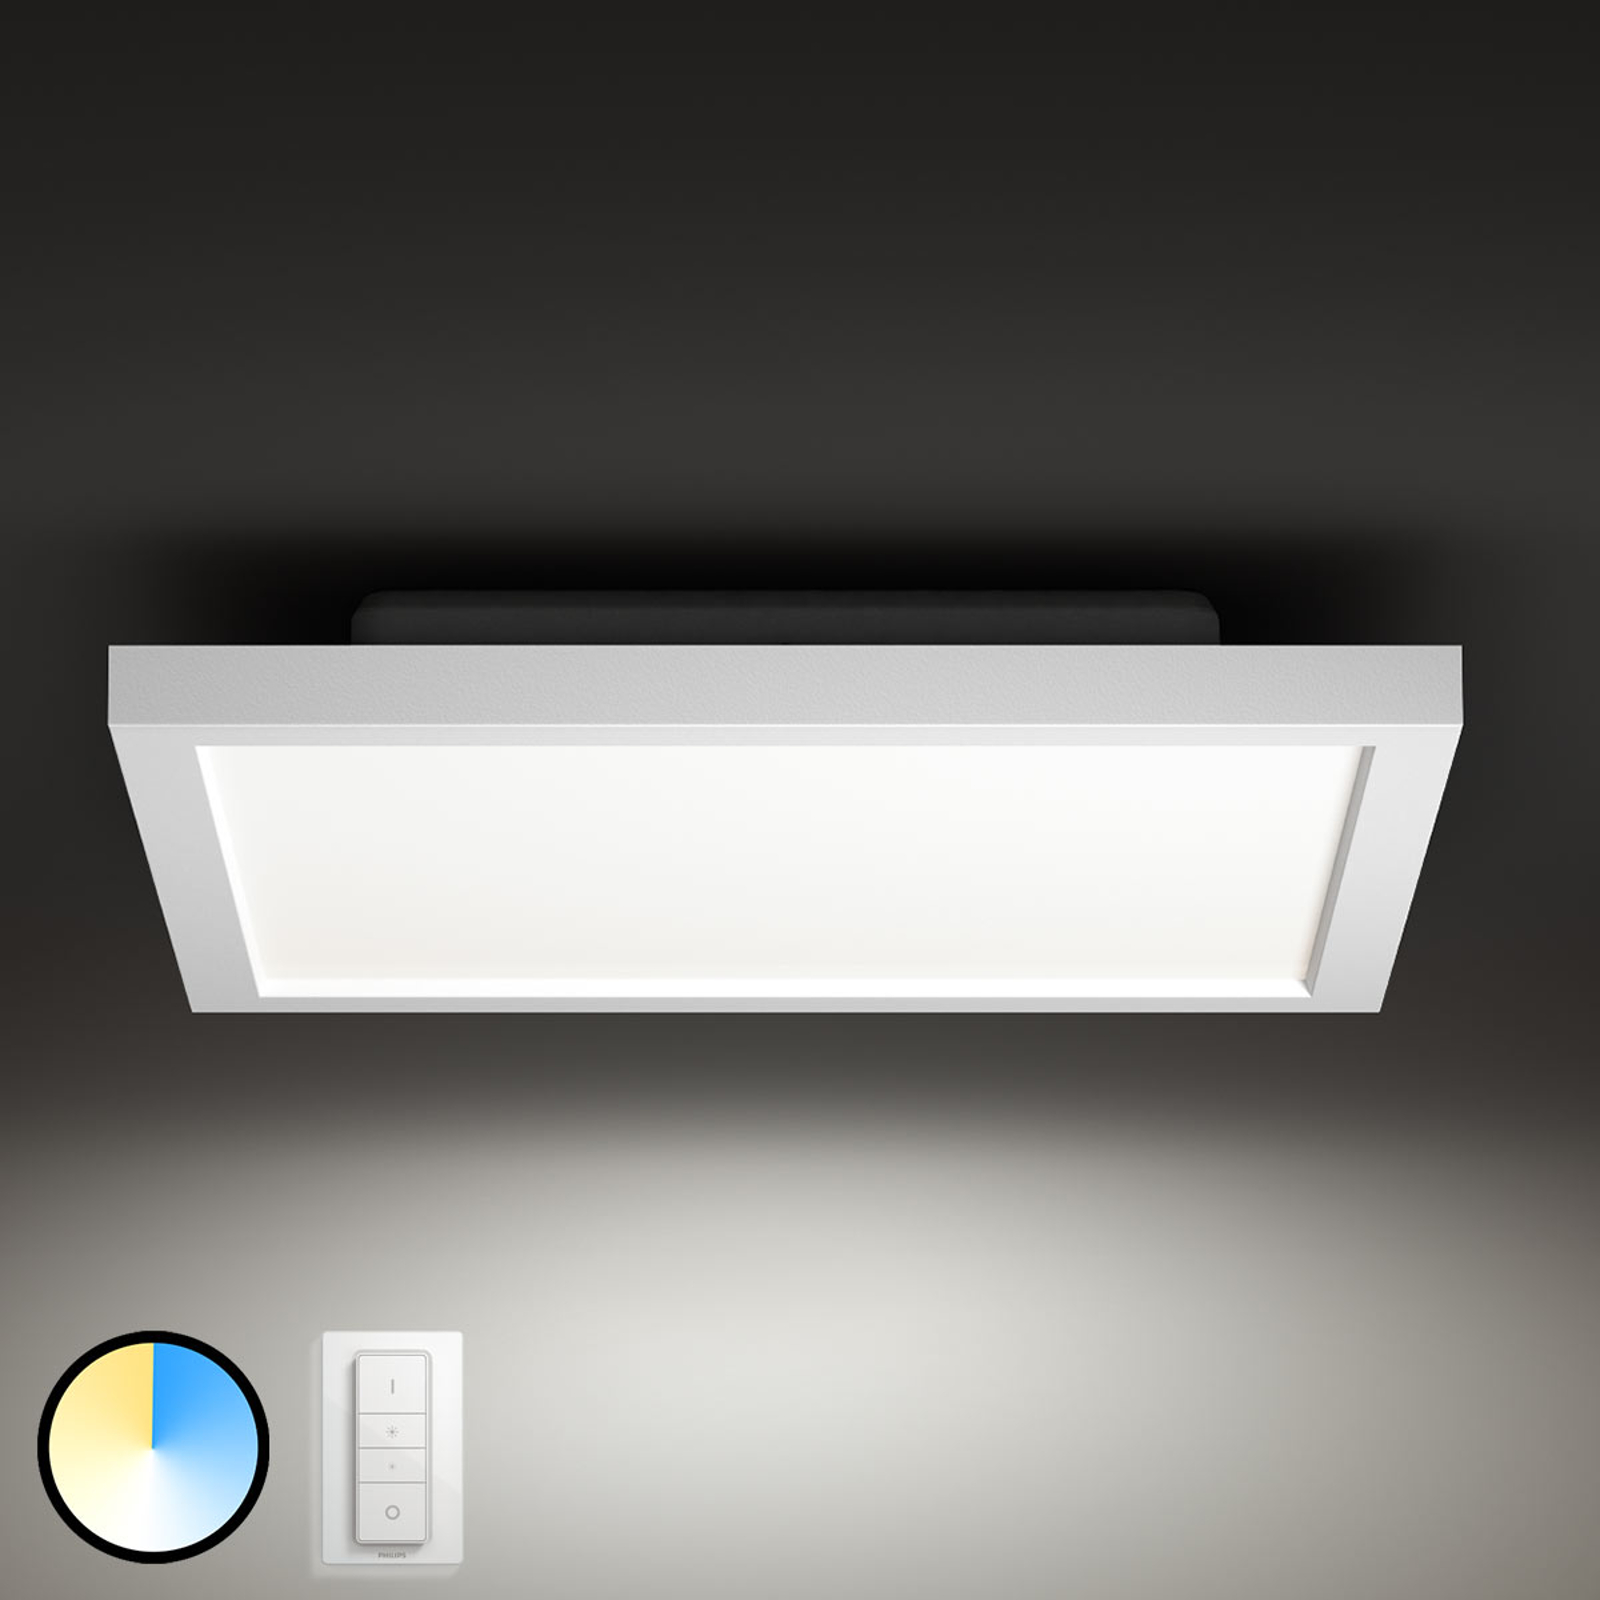 Philips Hue Aurelle LED-panel kantig, 30 x 30cm